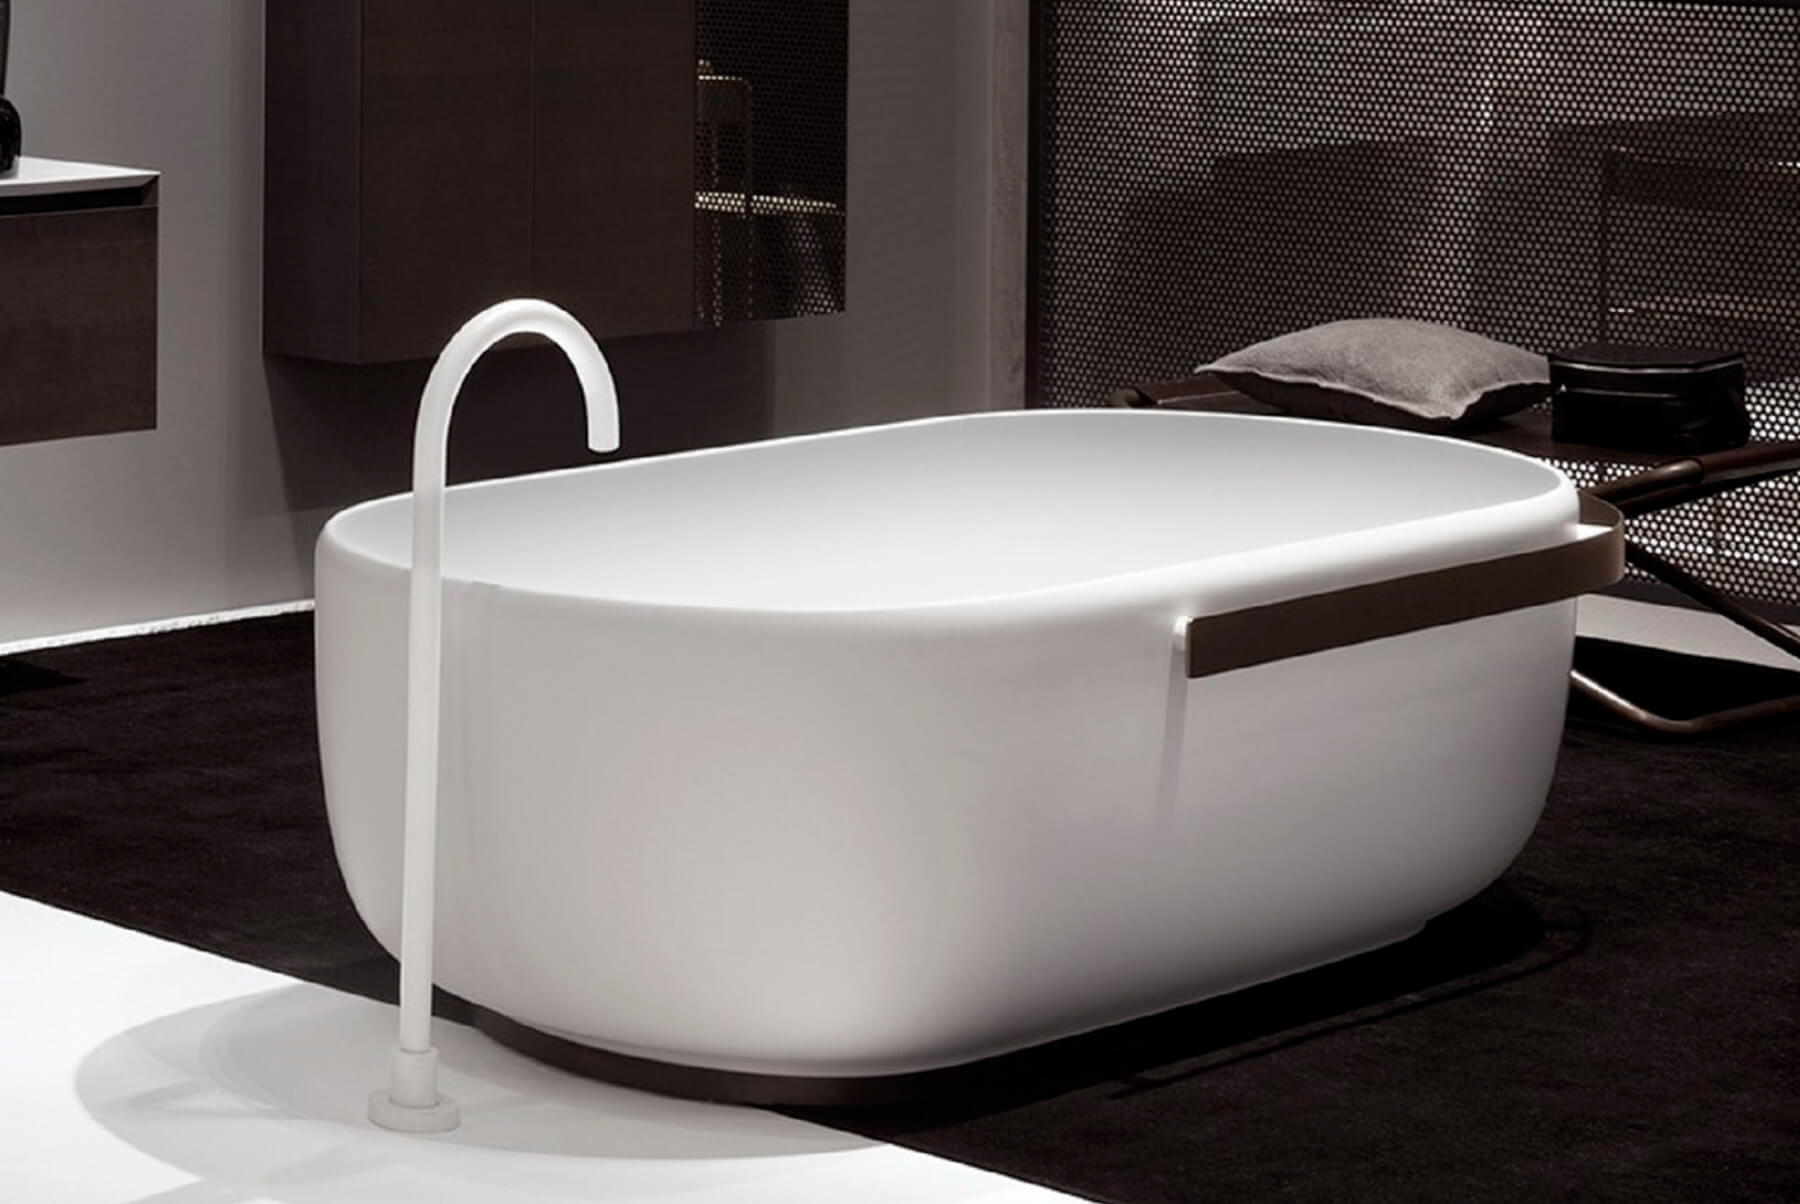 Bath-Tubs-FALPER-HOMEY-ANGLE-1800x1204